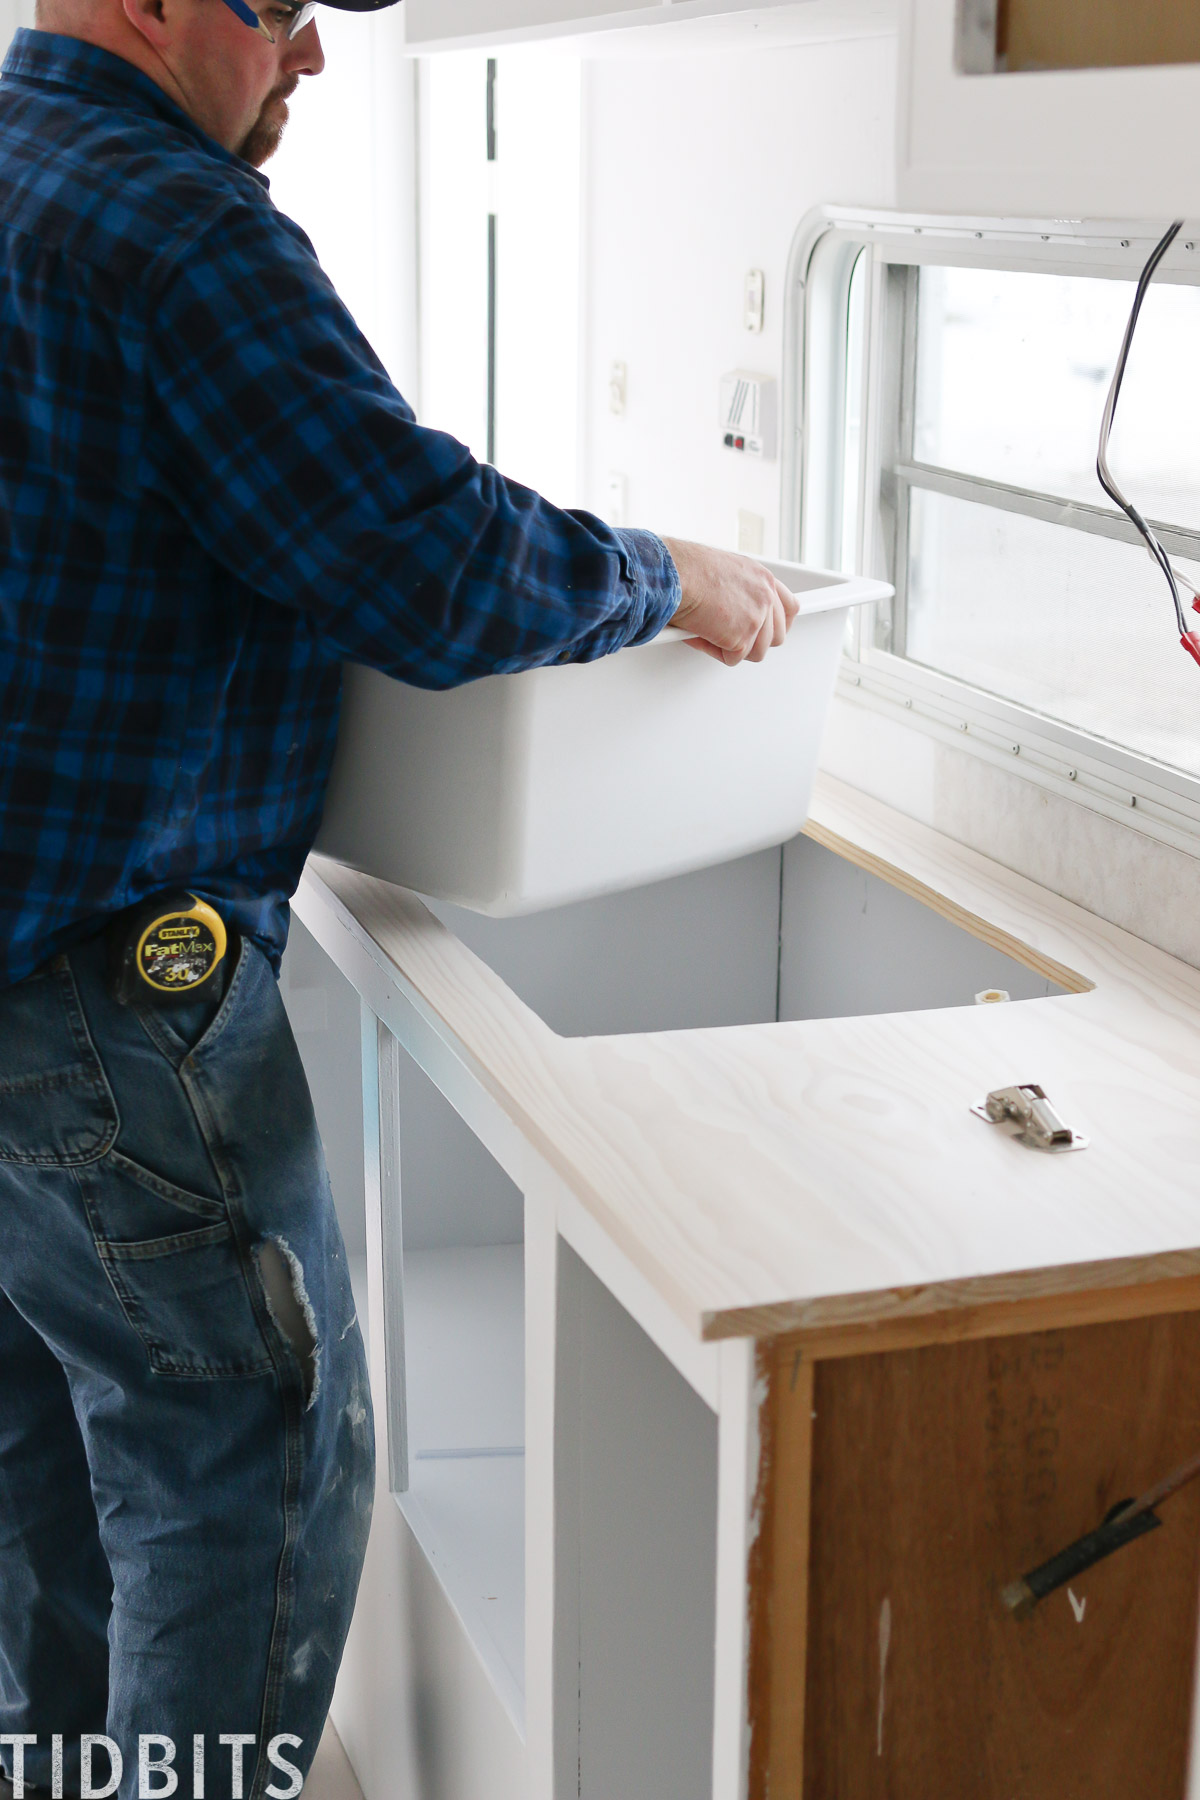 Installing sink in RV